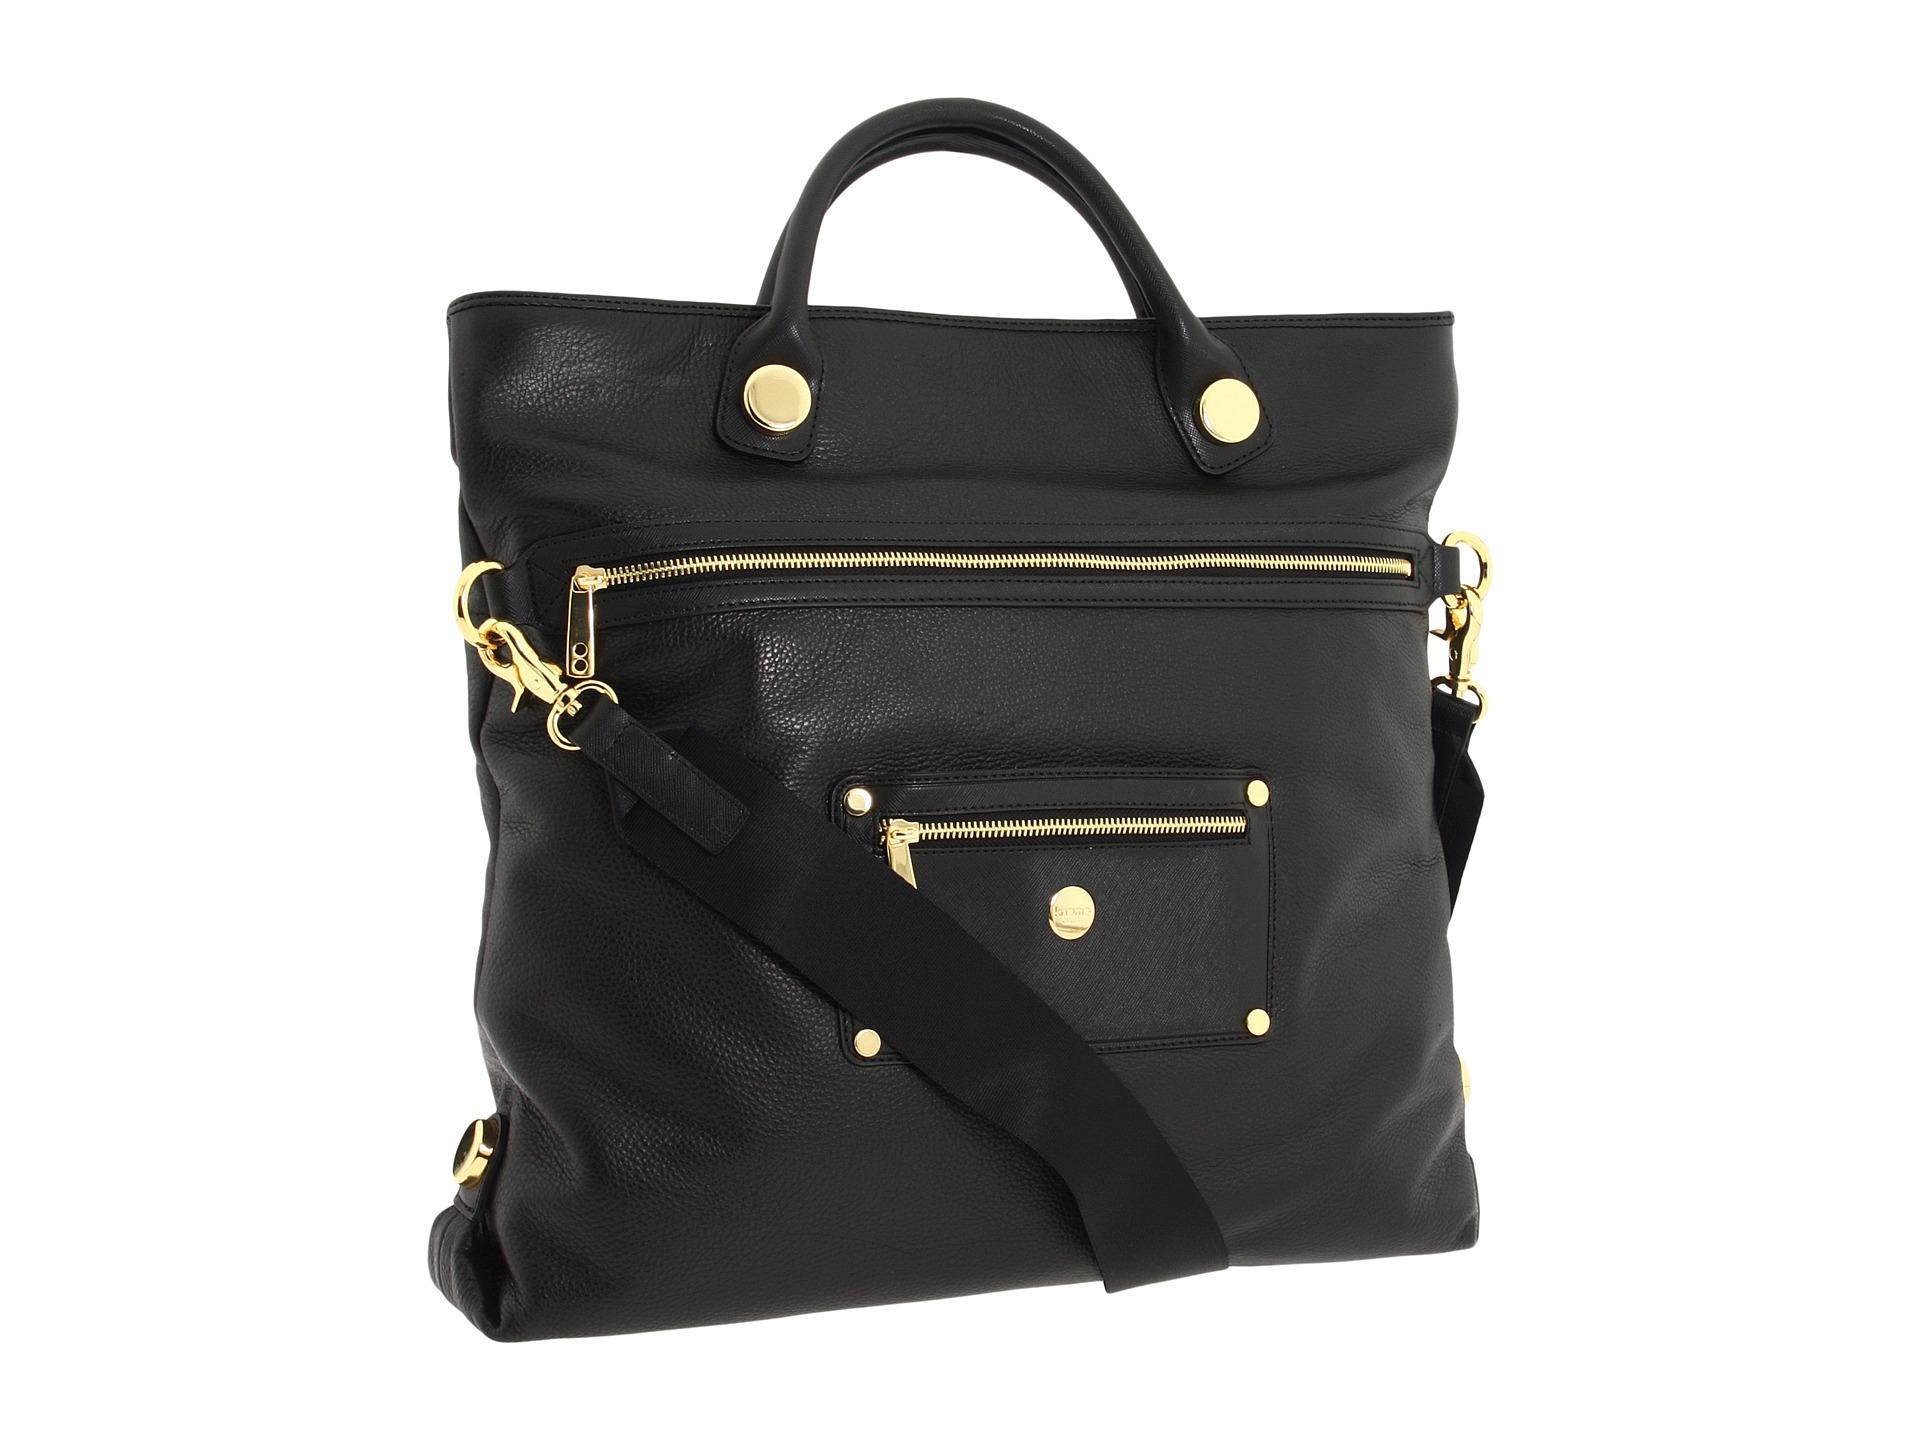 Fashion Star London Bags